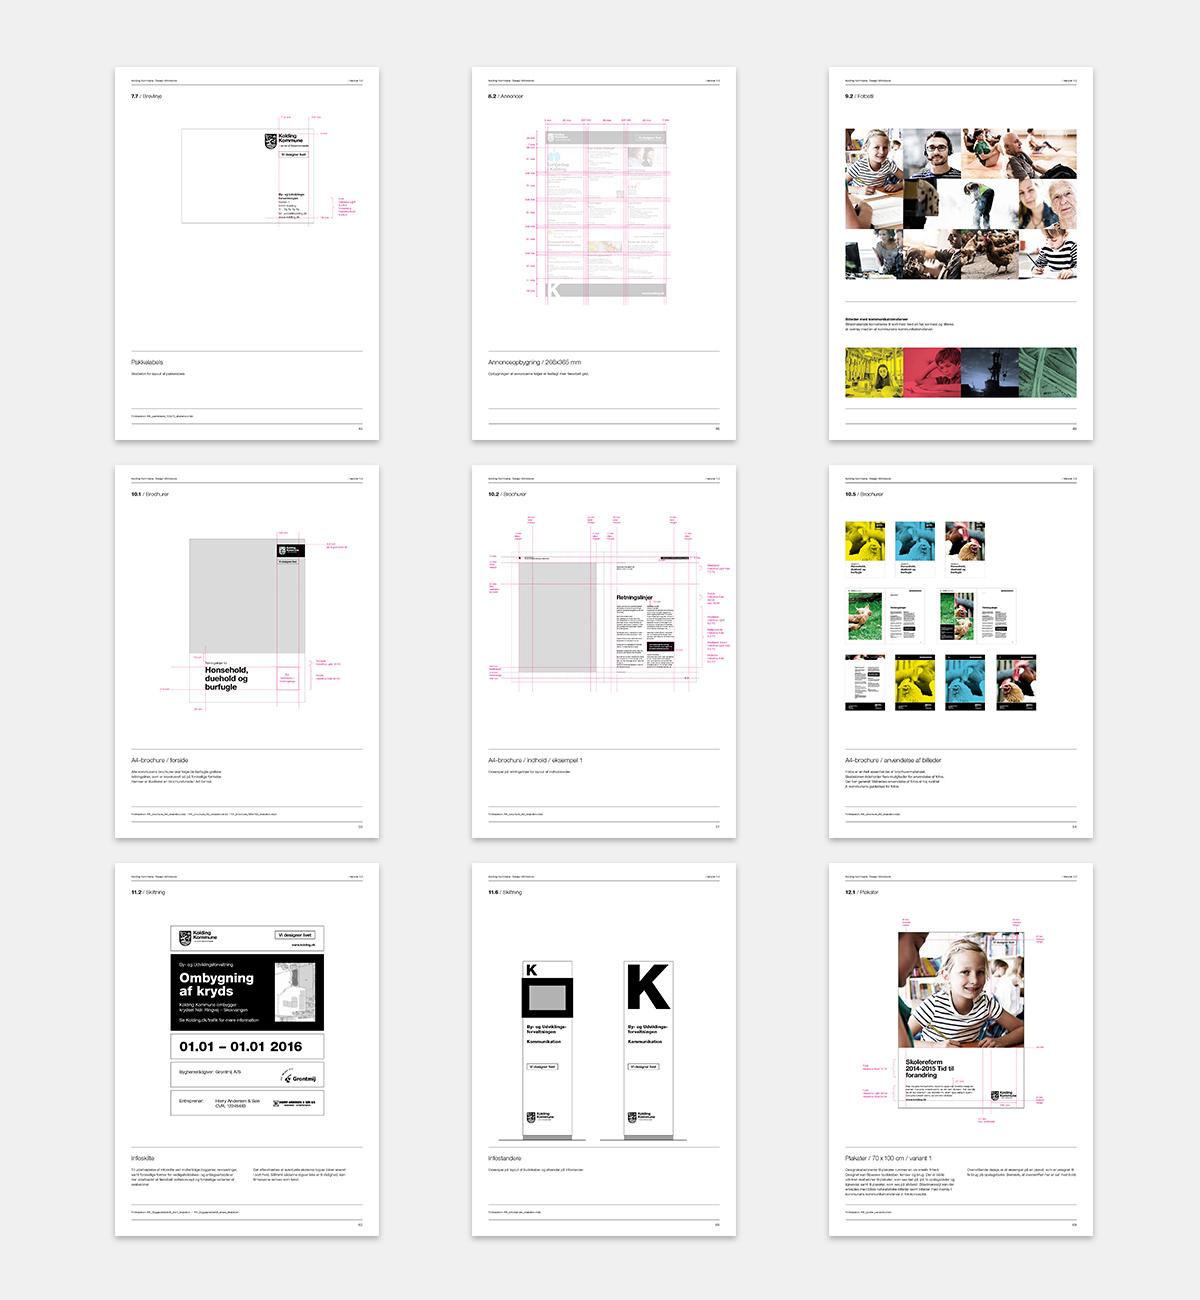 Kolding-Kommune-designguide-14